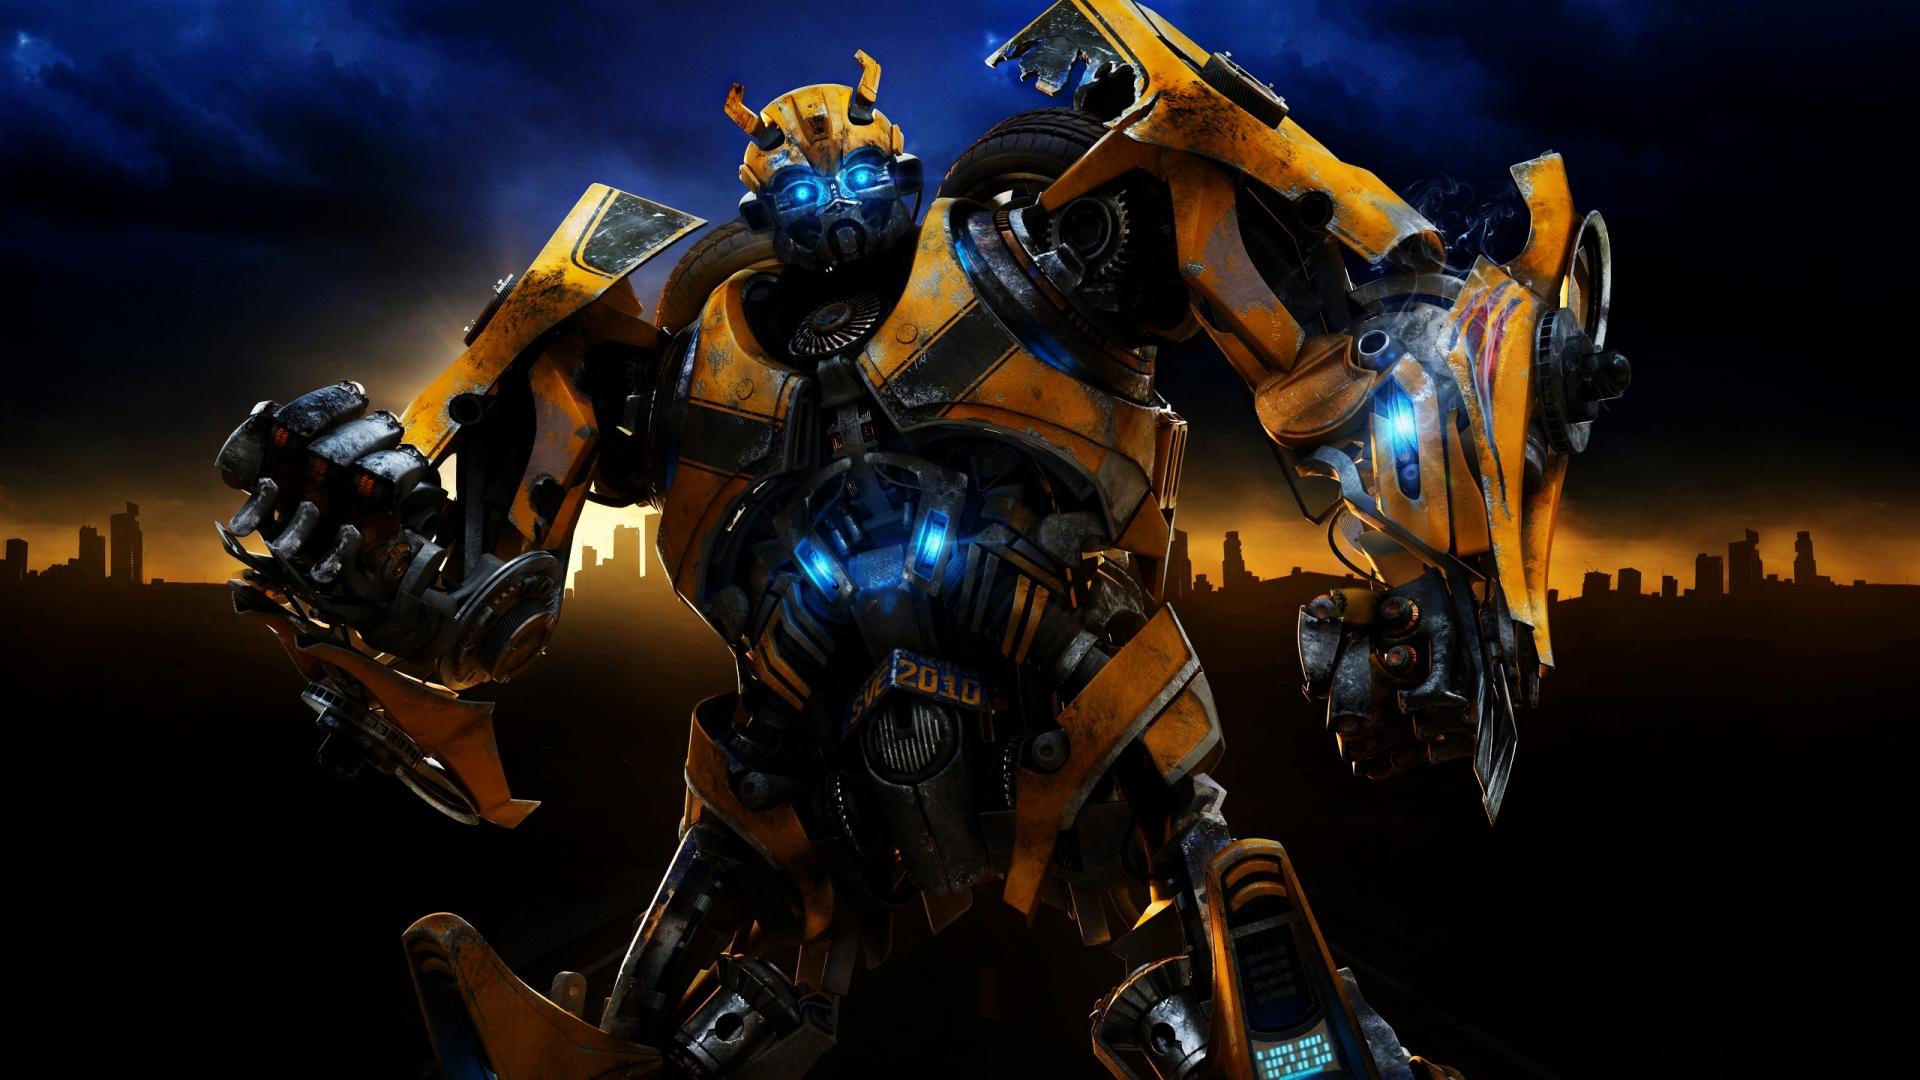 Transformers 2 Bumblebee Cool Wallpaper